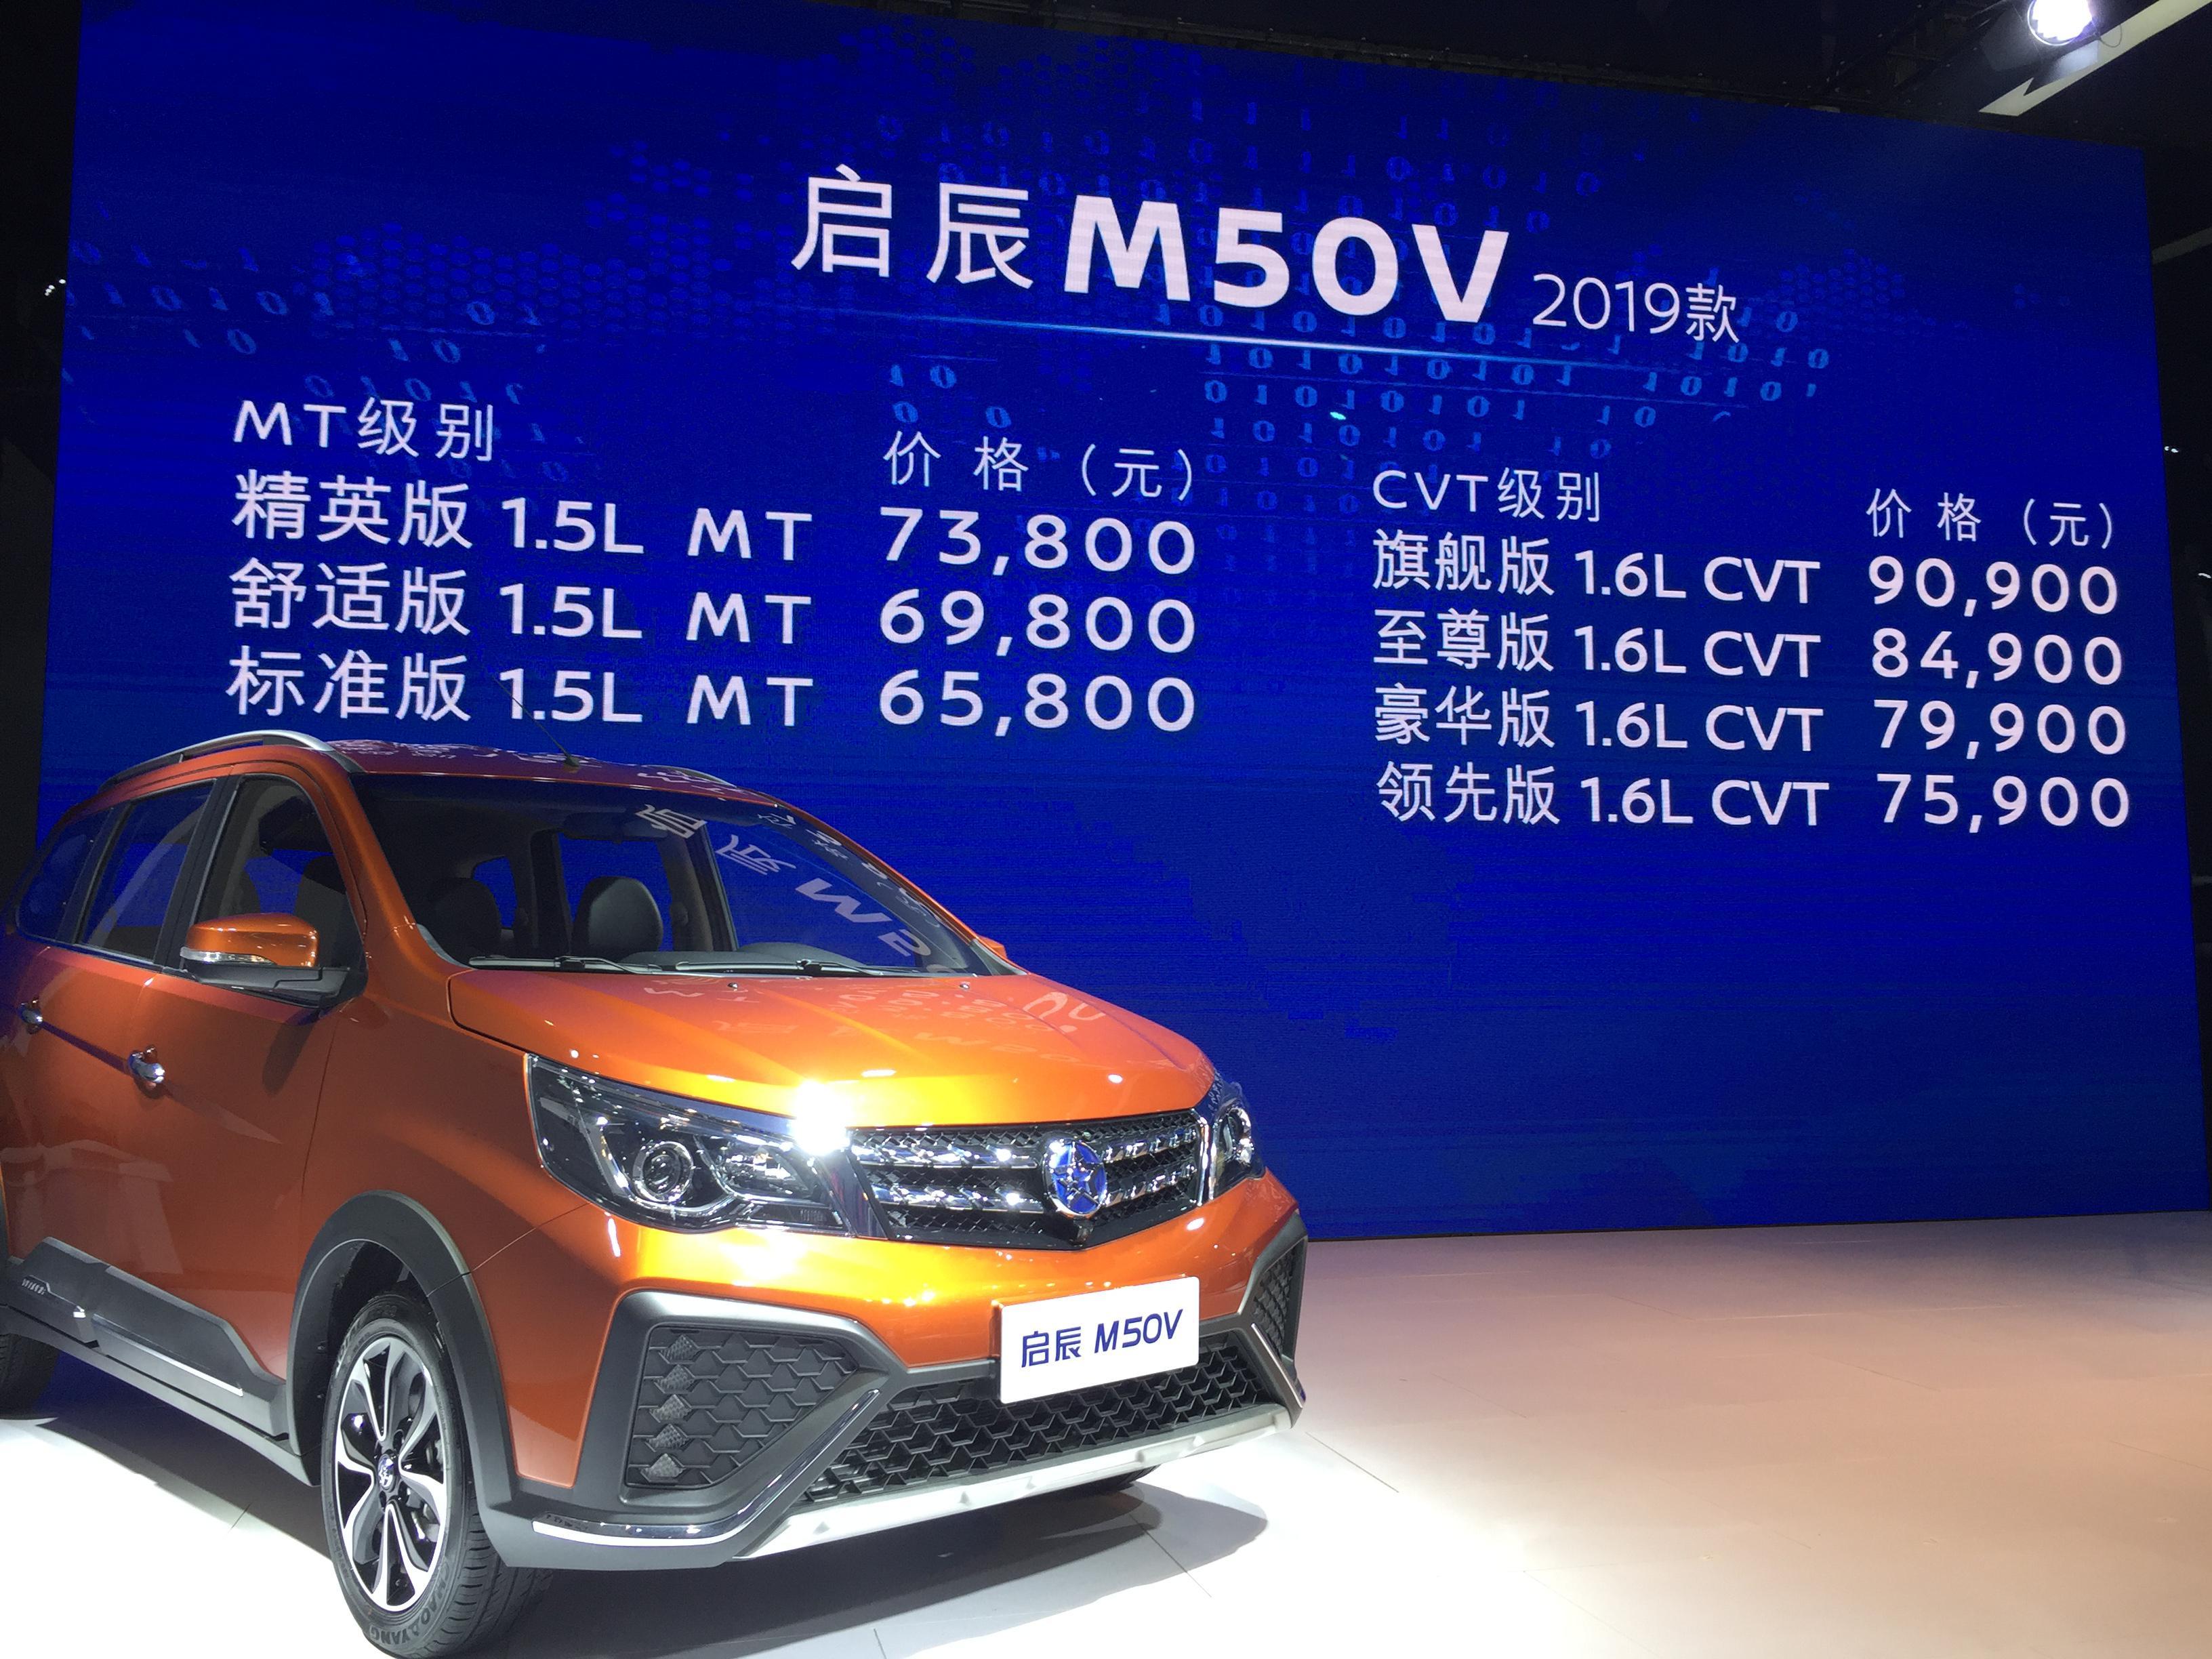 有MT也有CVT 启辰M50V七座MPV6.58万起售